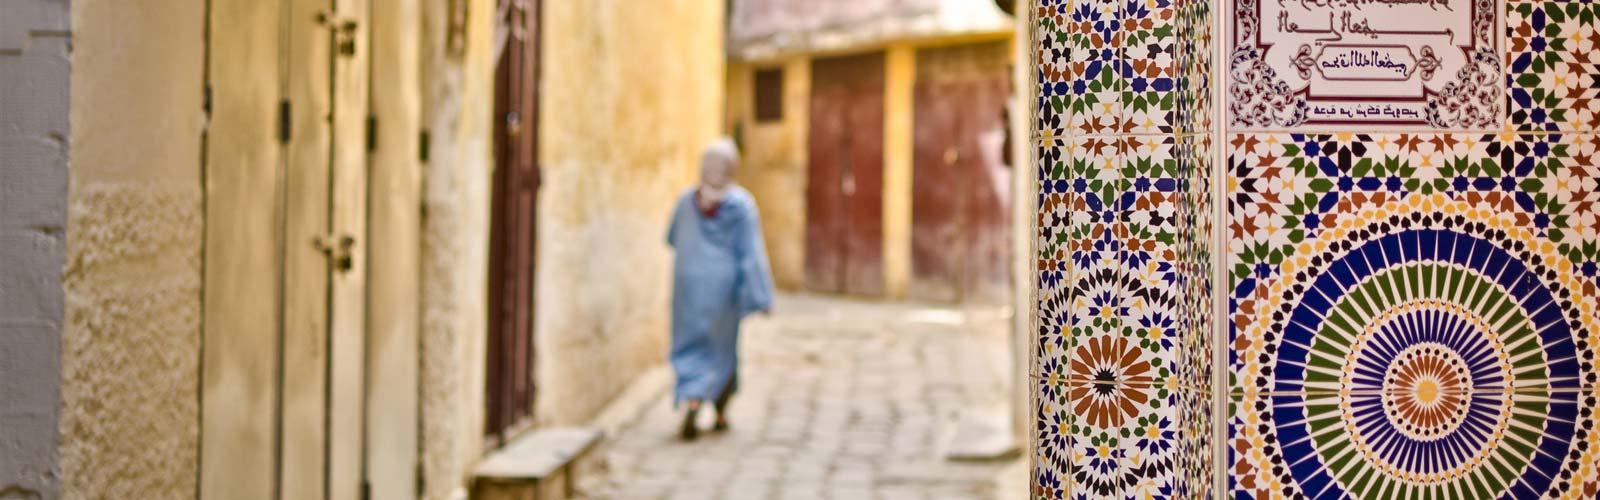 Viaje a Marruecos. 24 Feb.